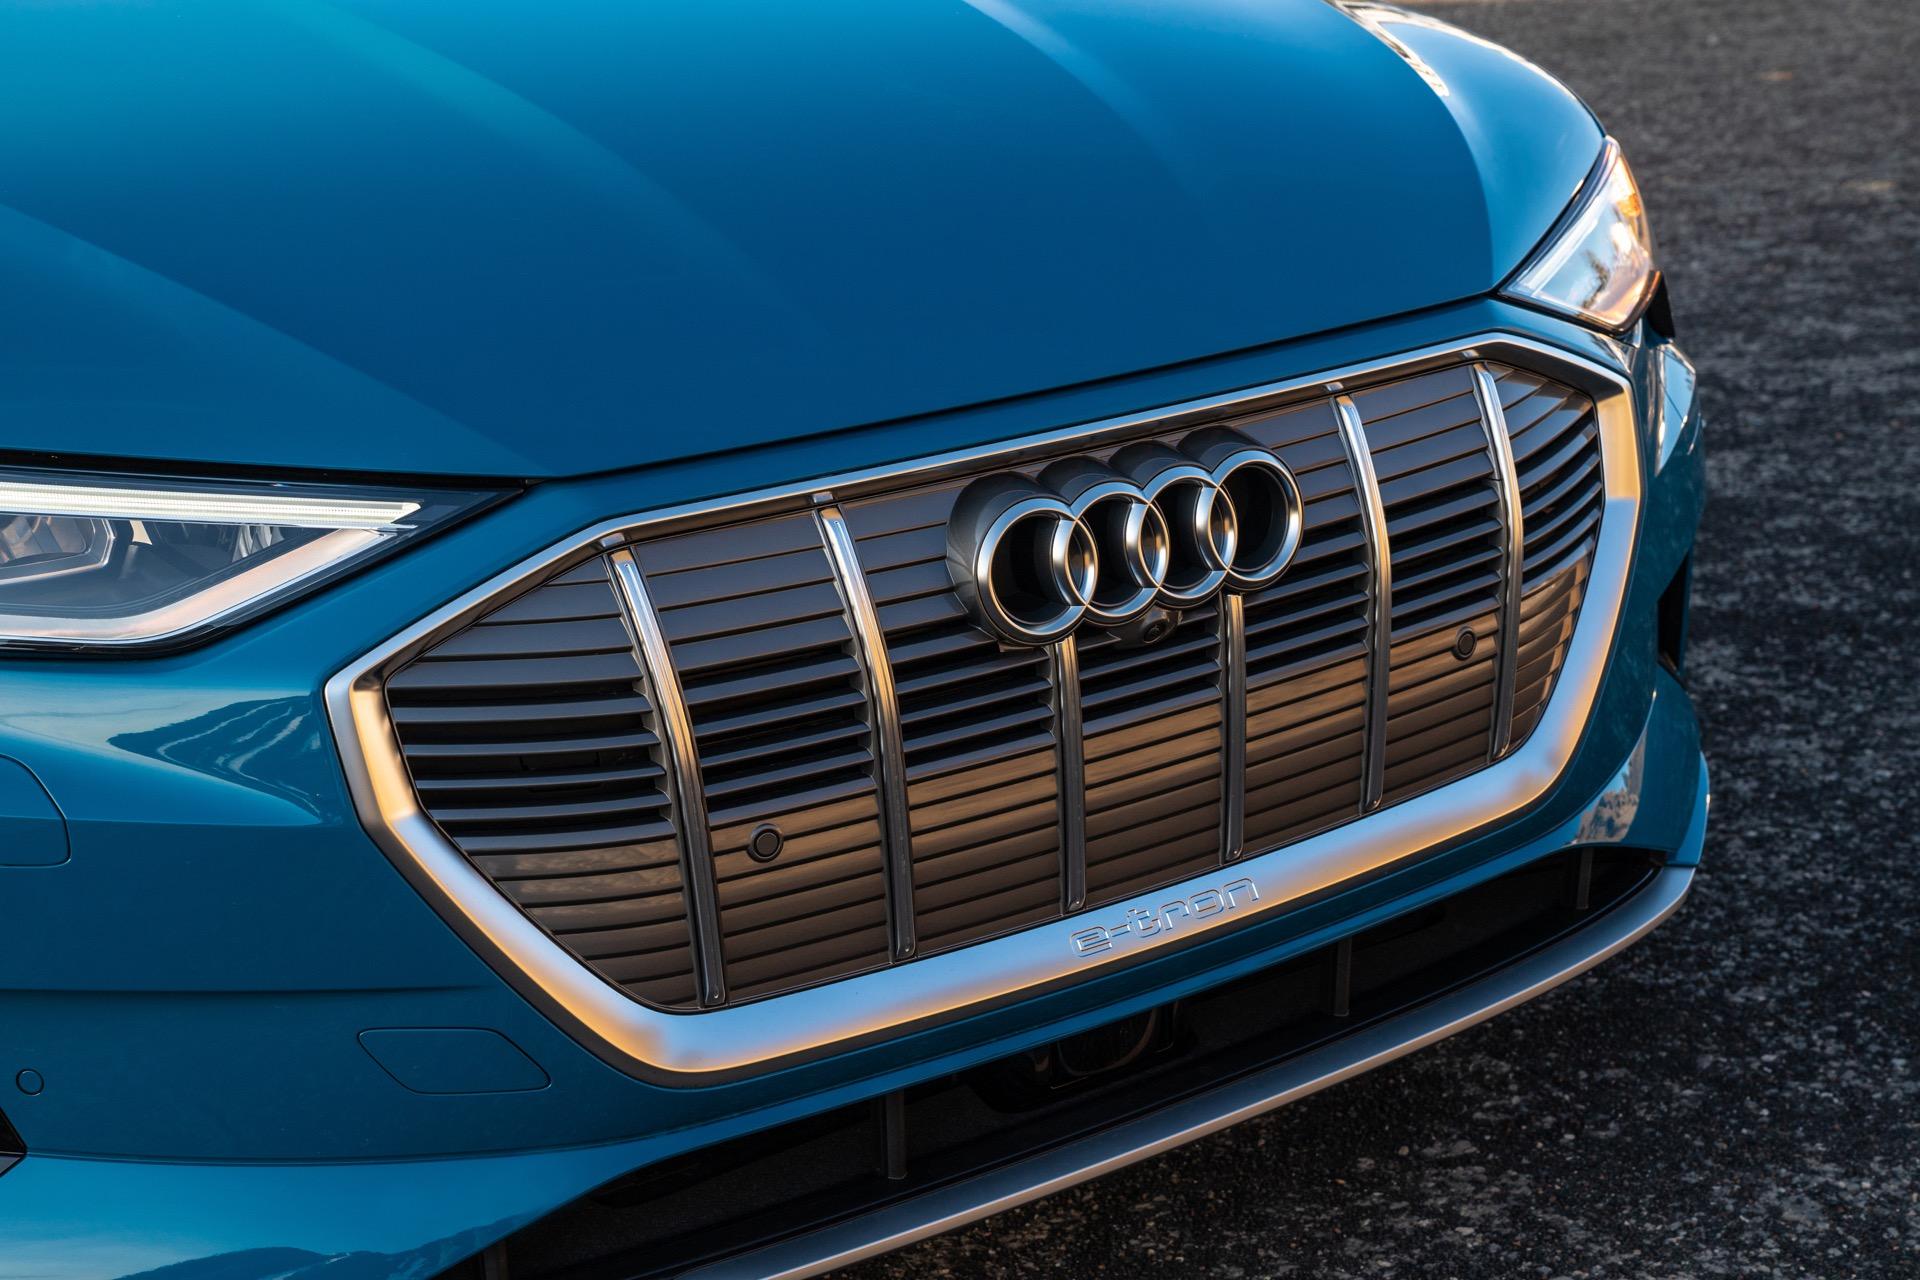 Electric Porsche Macan tipped to spawn Q6 E-Tron at Audi